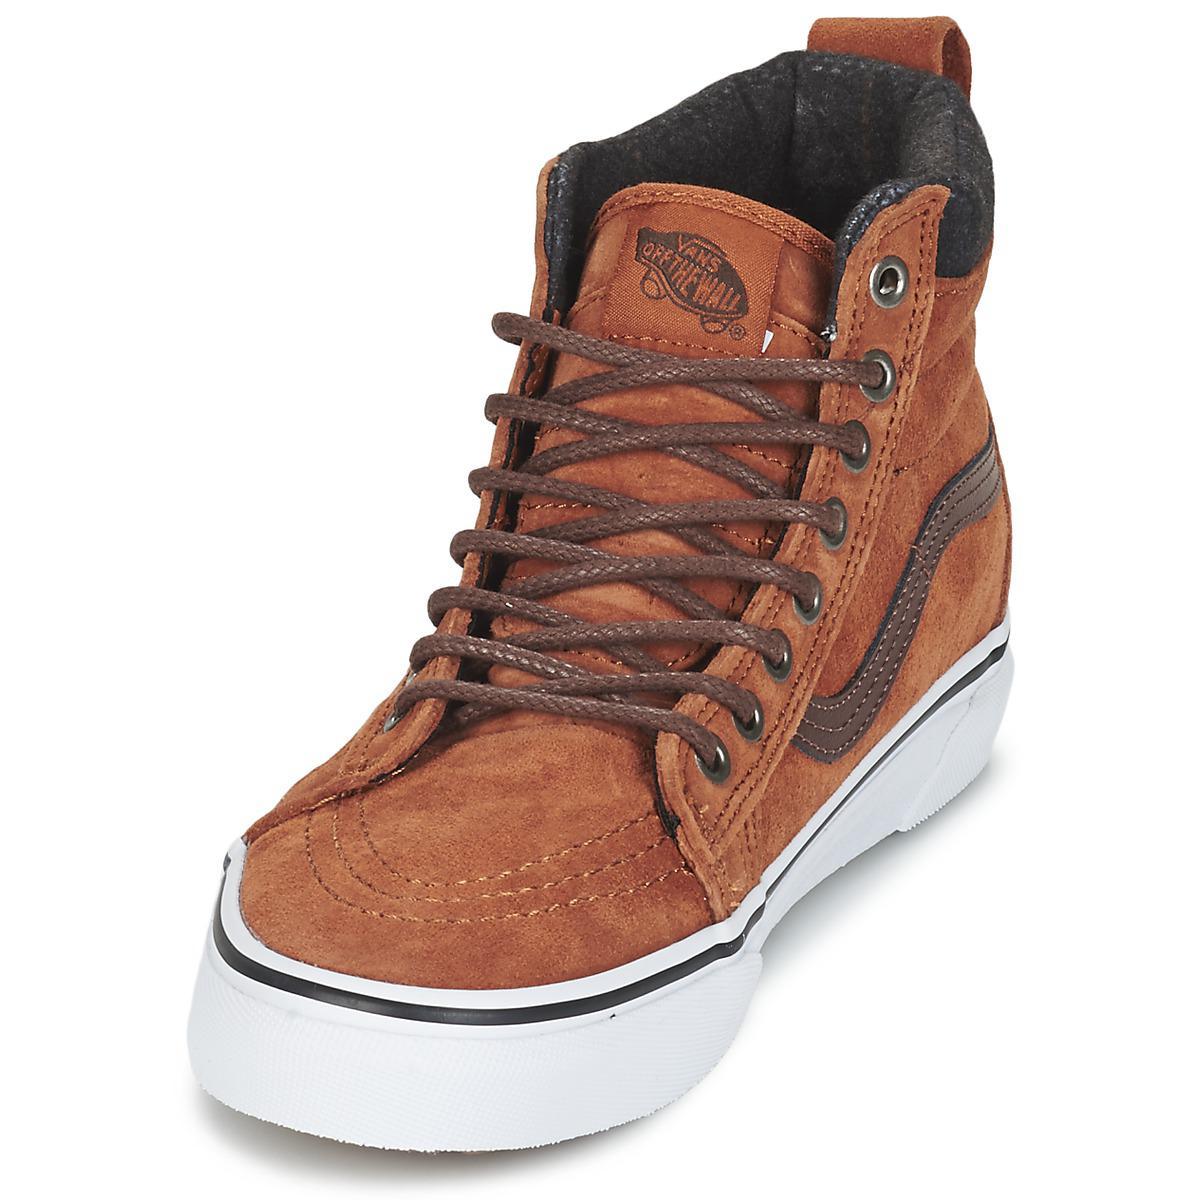 Vans Sk8-hi Mte Shoes (high-top Trainers) in Brown